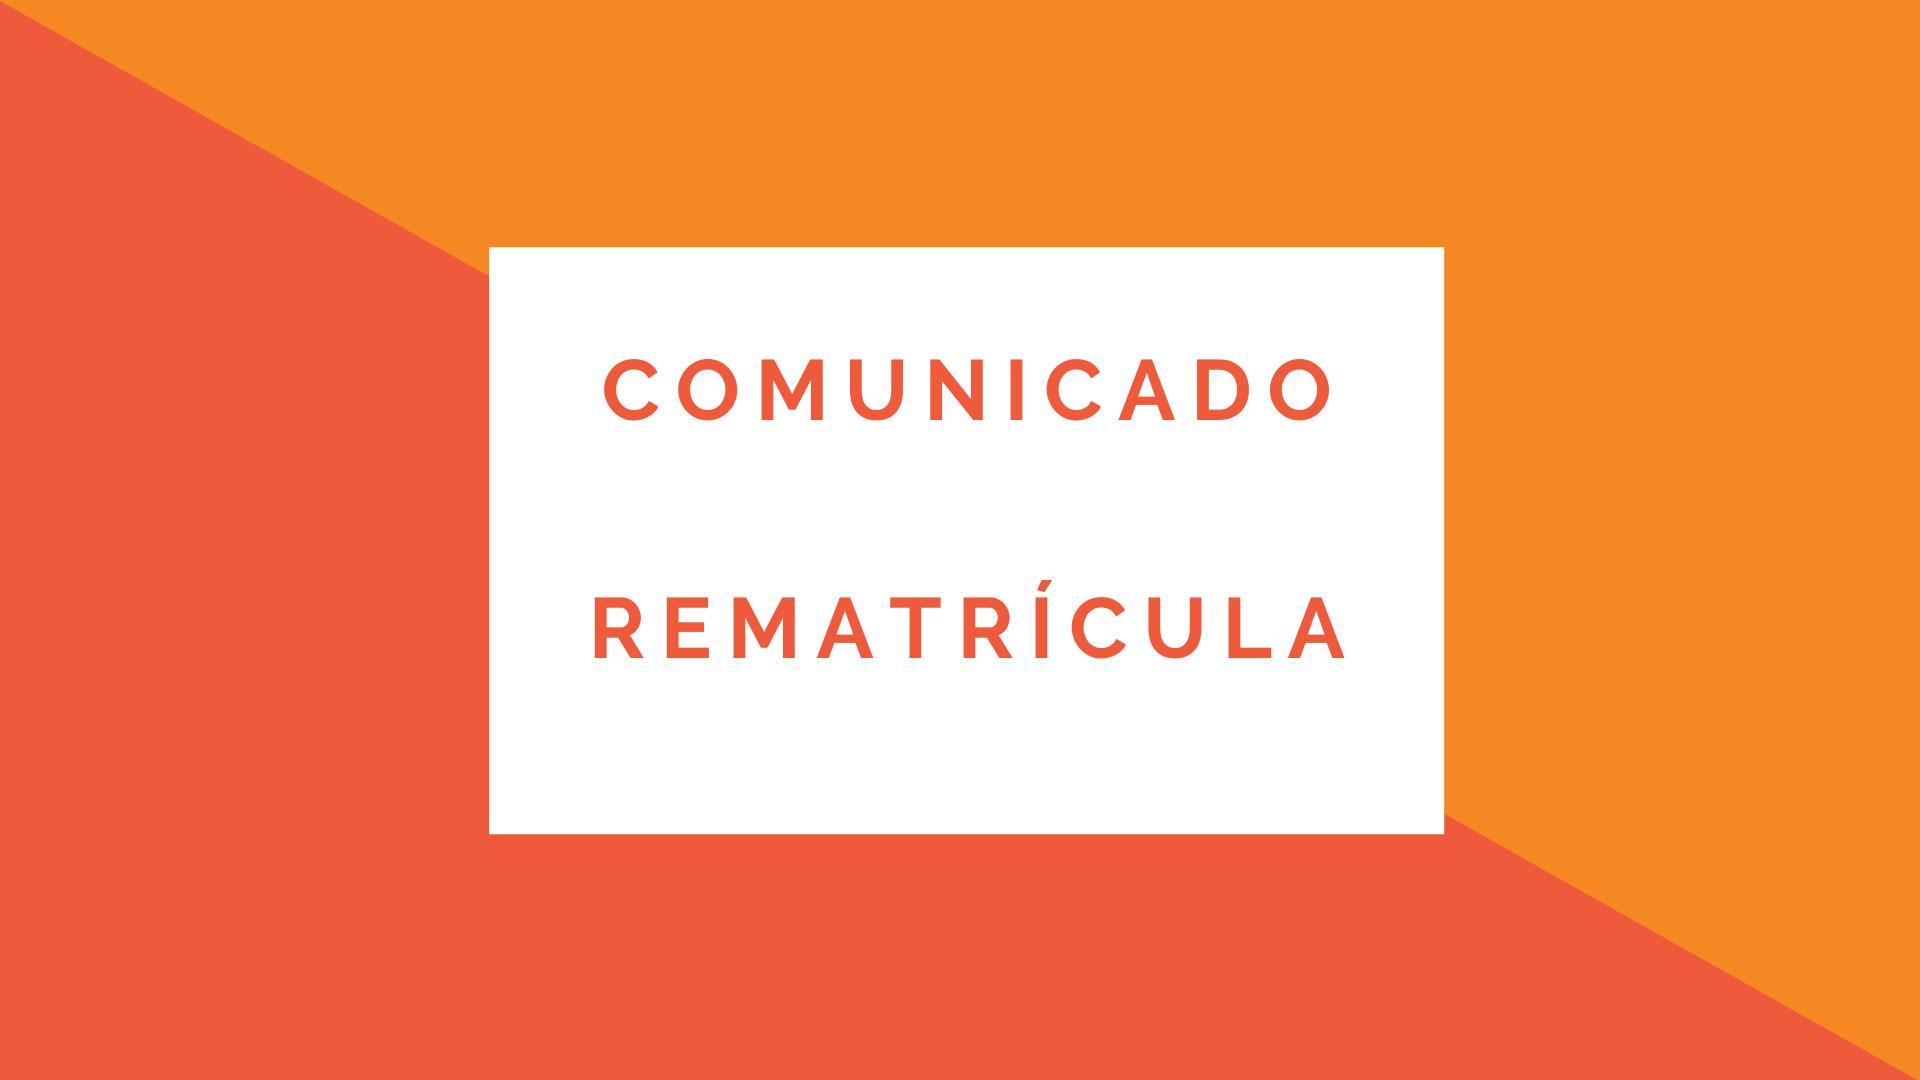 Comunicado - Rematrícula